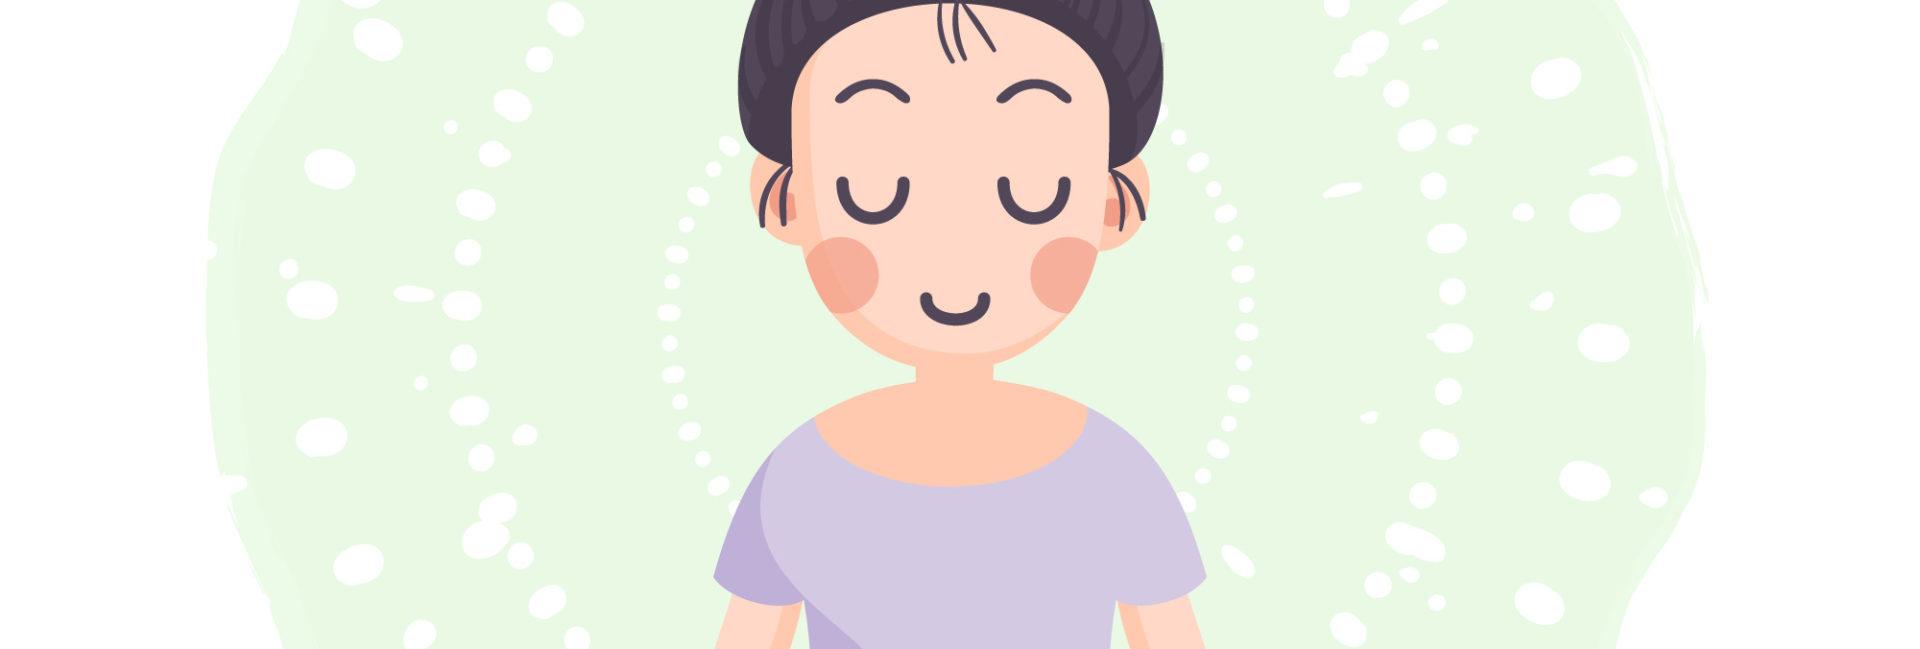 meditacao-conheca-os-beneficios-dessa-pratica